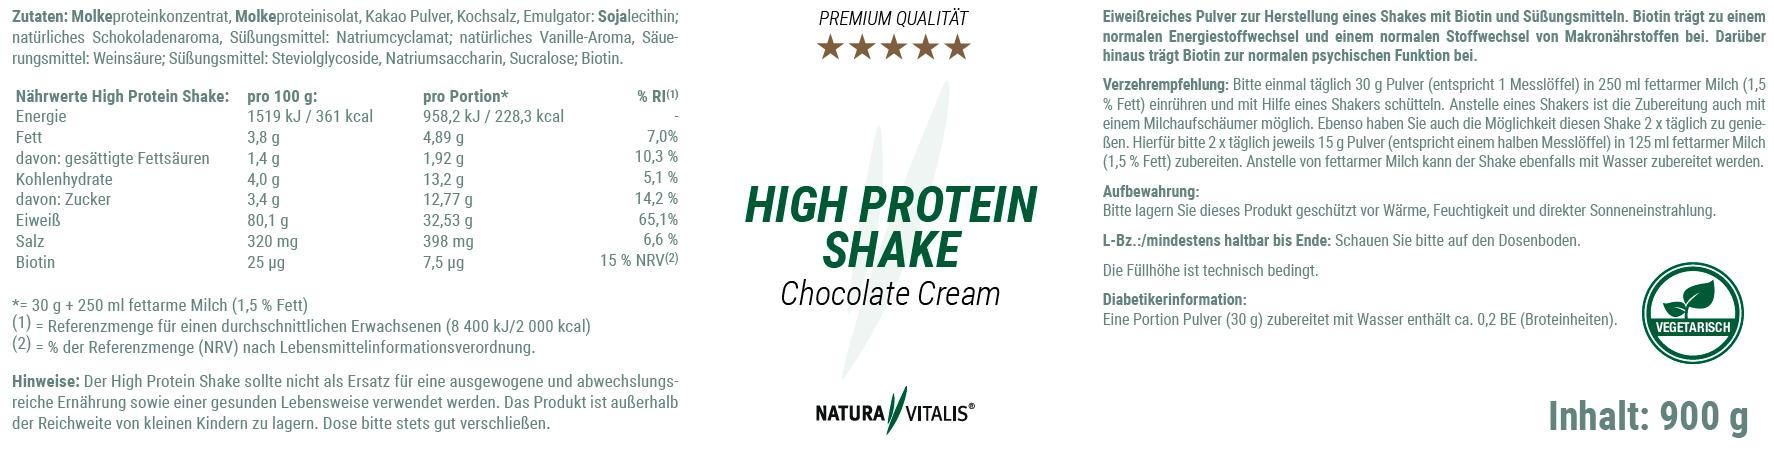 High Protein Shake von Natura Vitalis